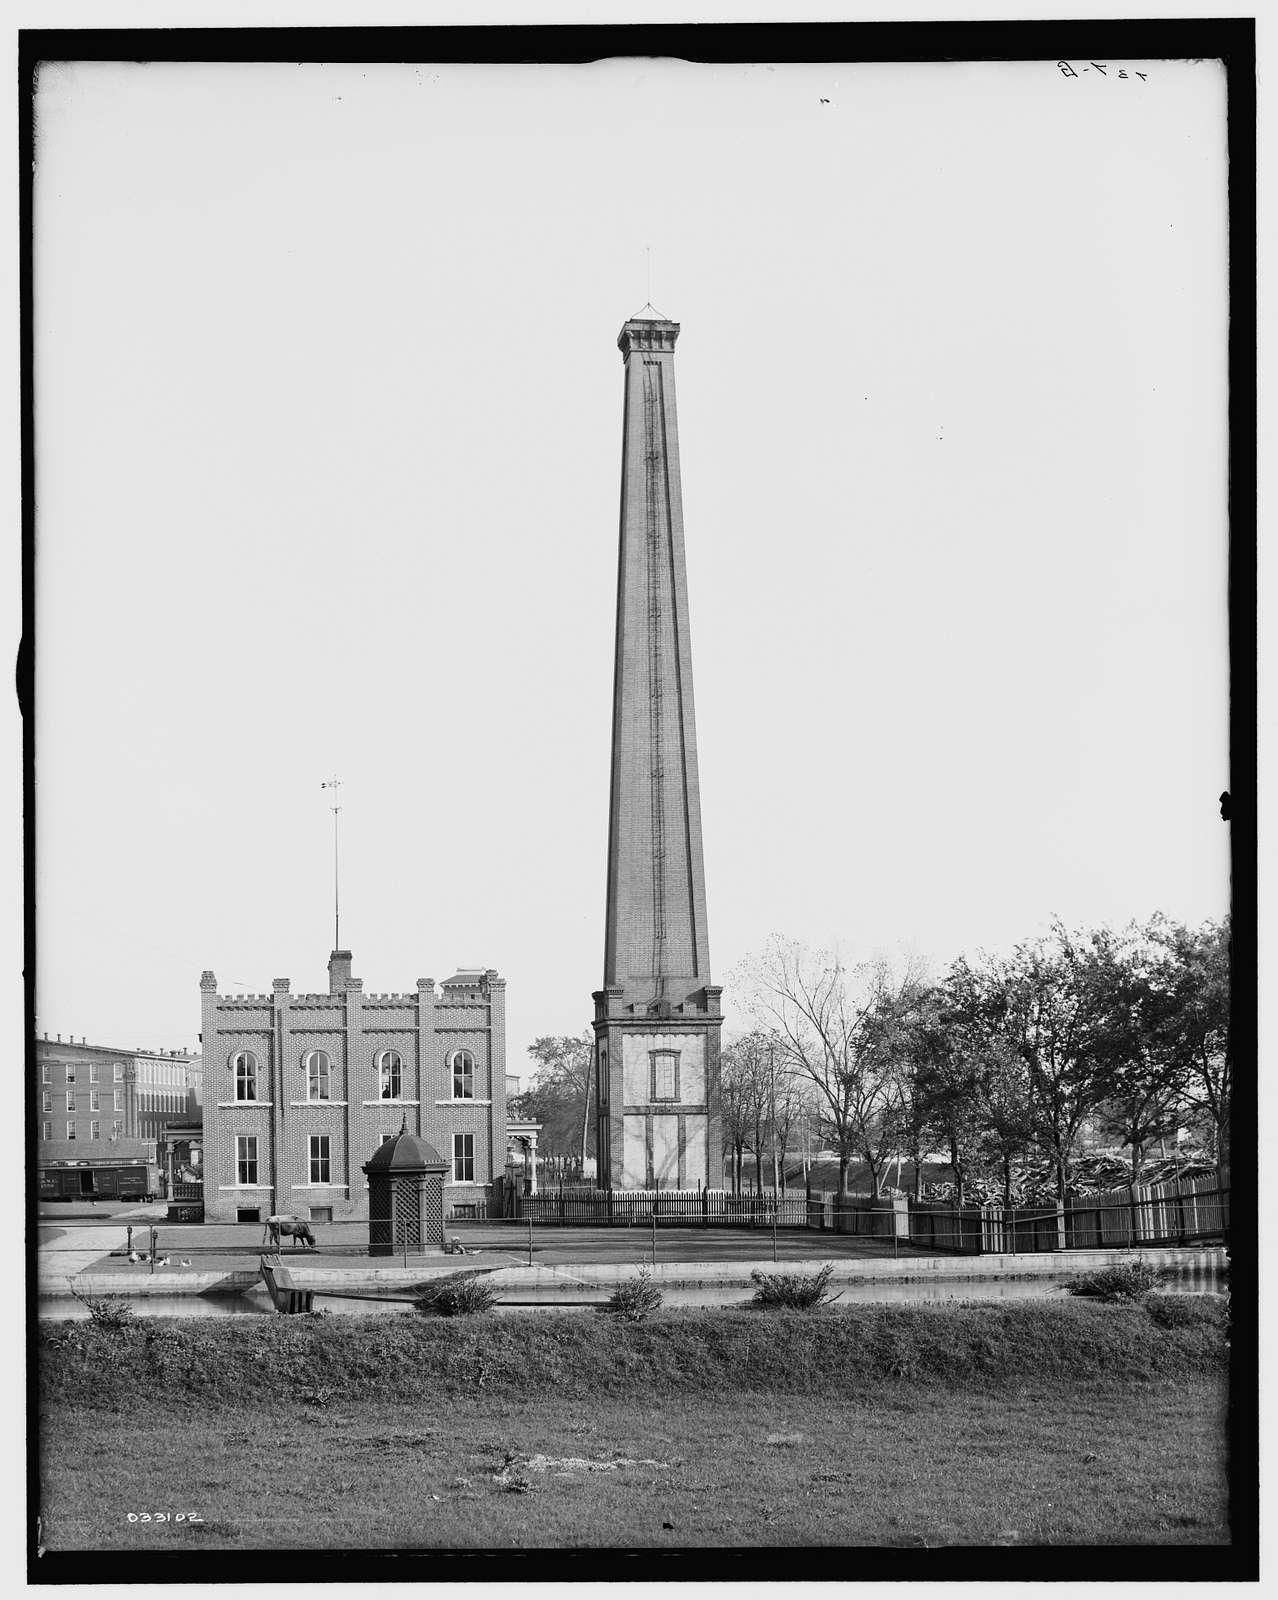 Chimney of old Confederate Powder Works Mill, Augusta, Ga.